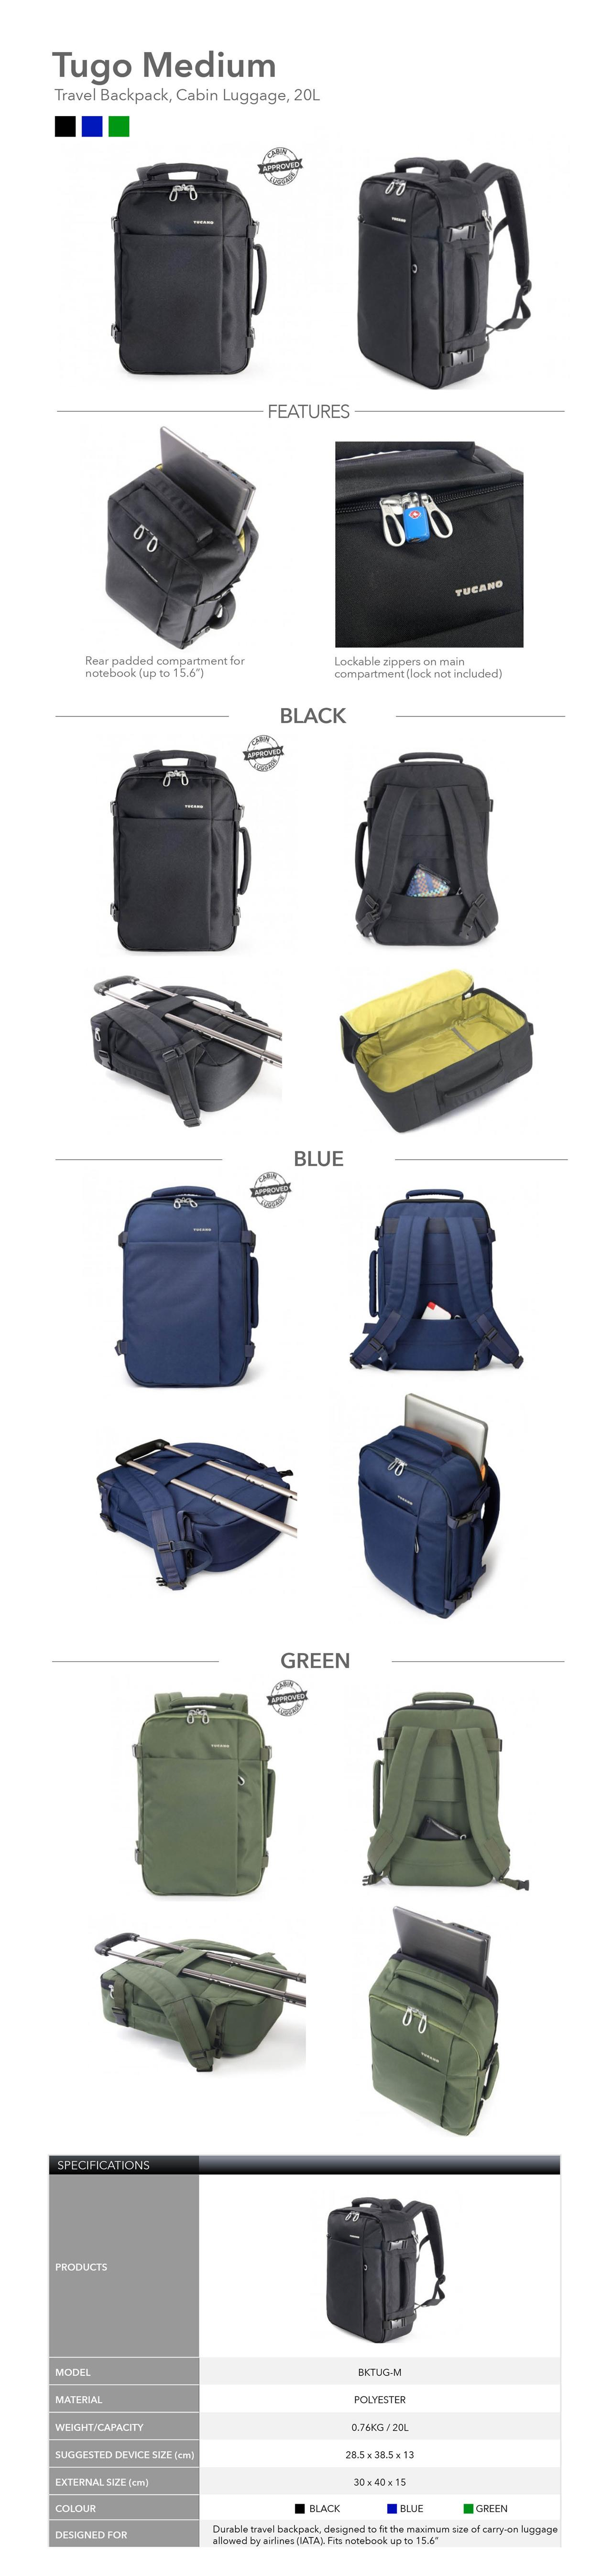 5bb49f943f63 Specifications of Tucano Tugo Medium Travel Backpack